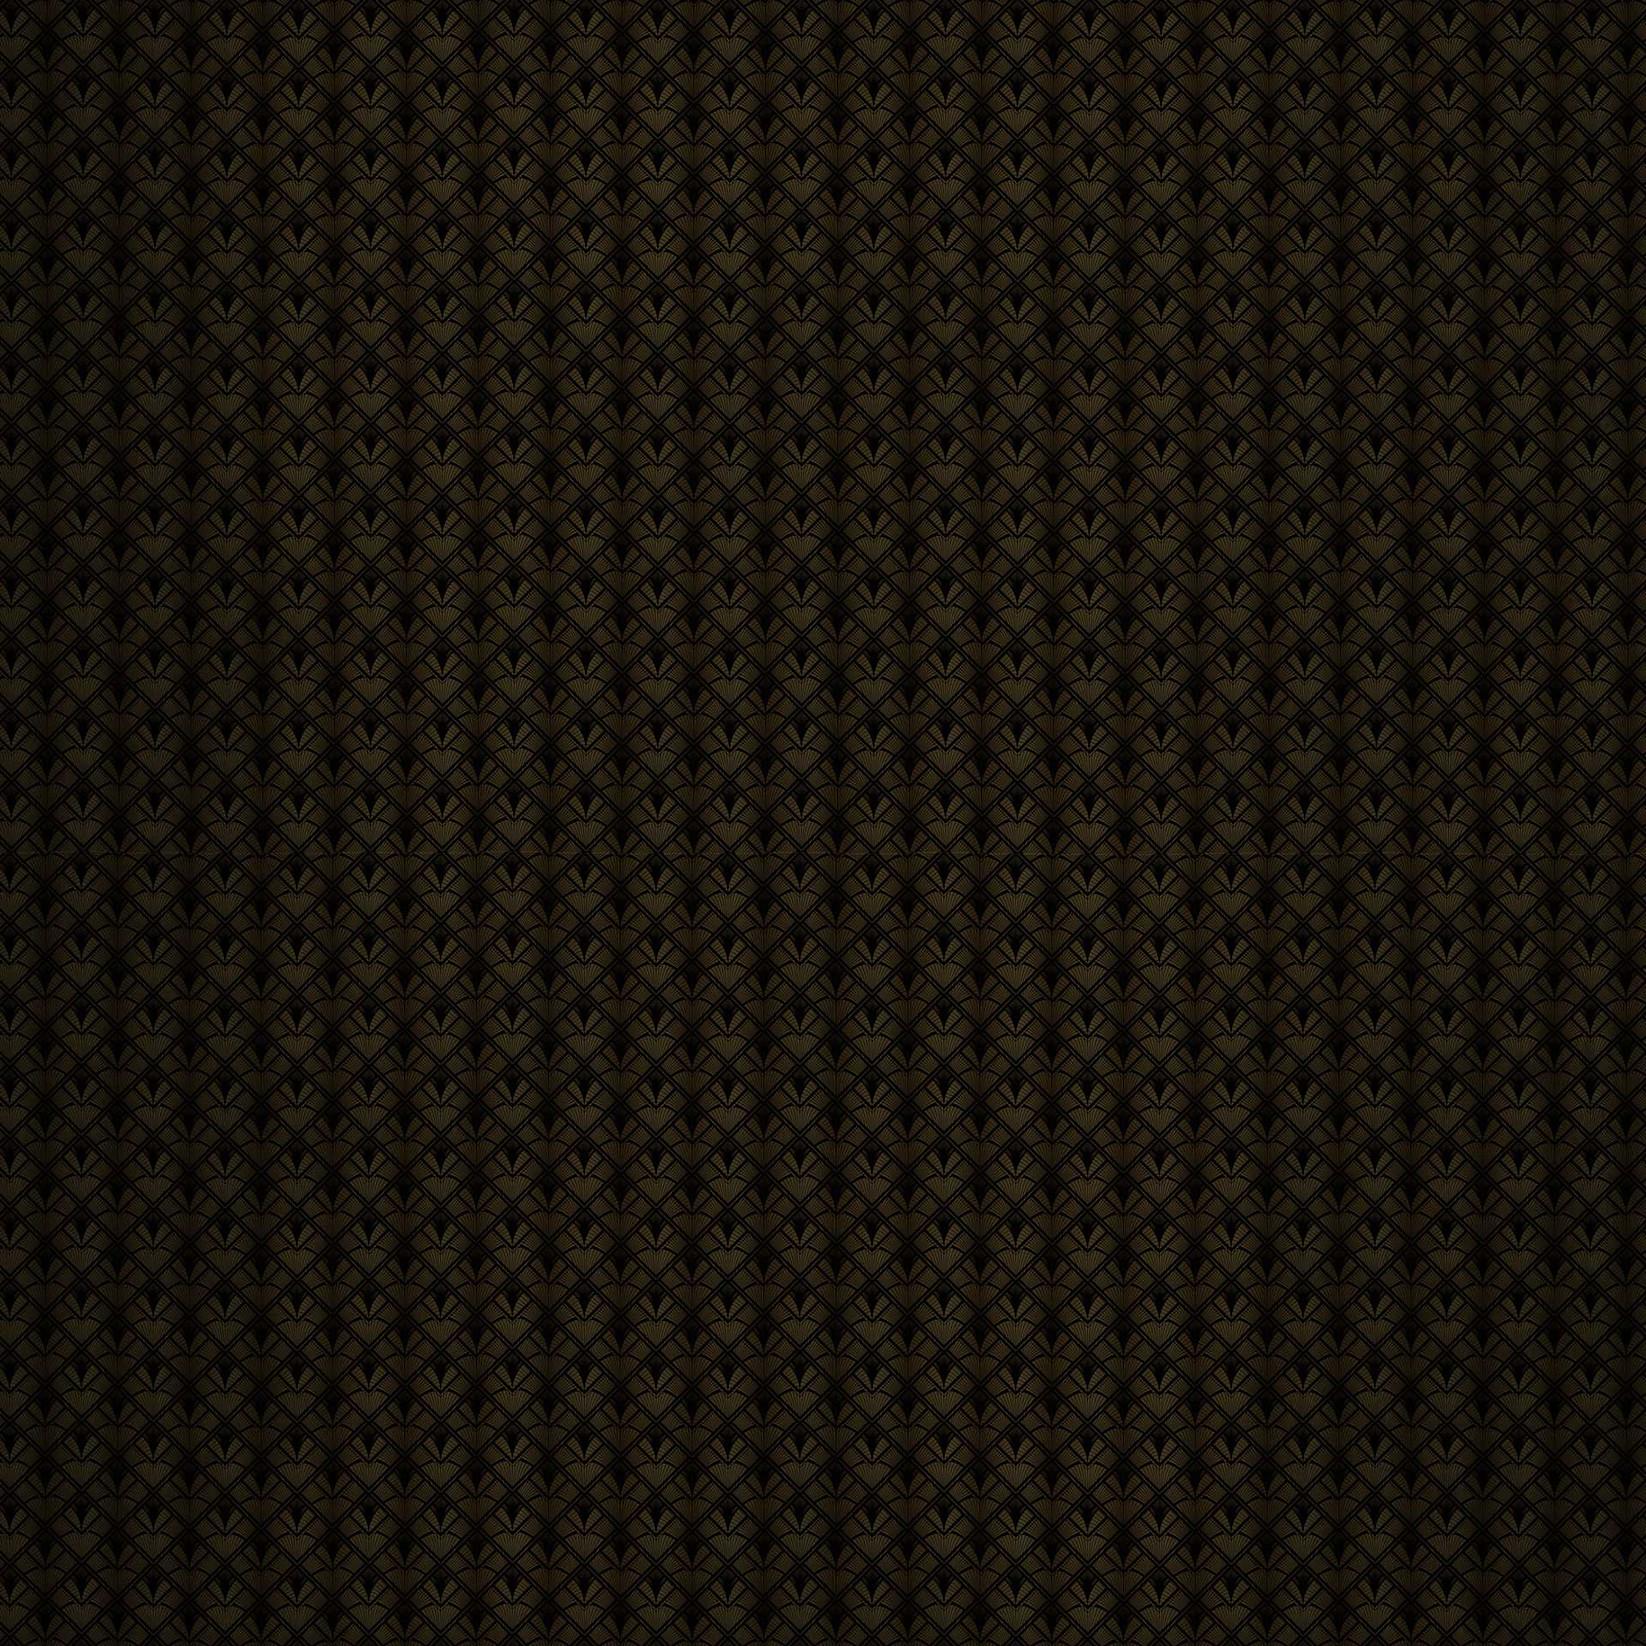 SPEAK-WALLP-SMALL.jpg